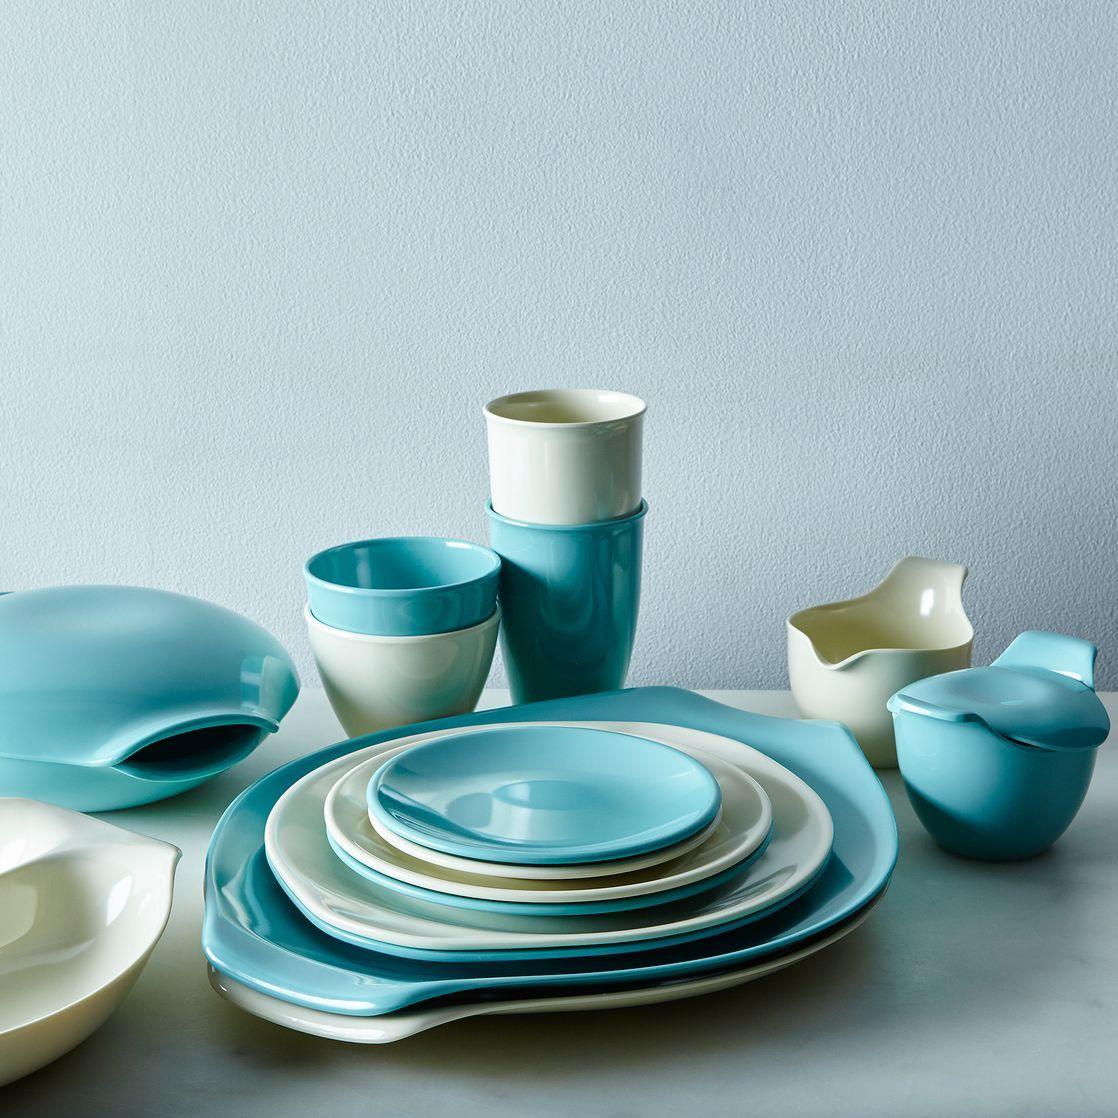 Russel Wright Melamine Dinnerware u0026 Serveware & Russel Wright Melamine Dinnerware u0026 Serveware | Shops Dinnerware ...